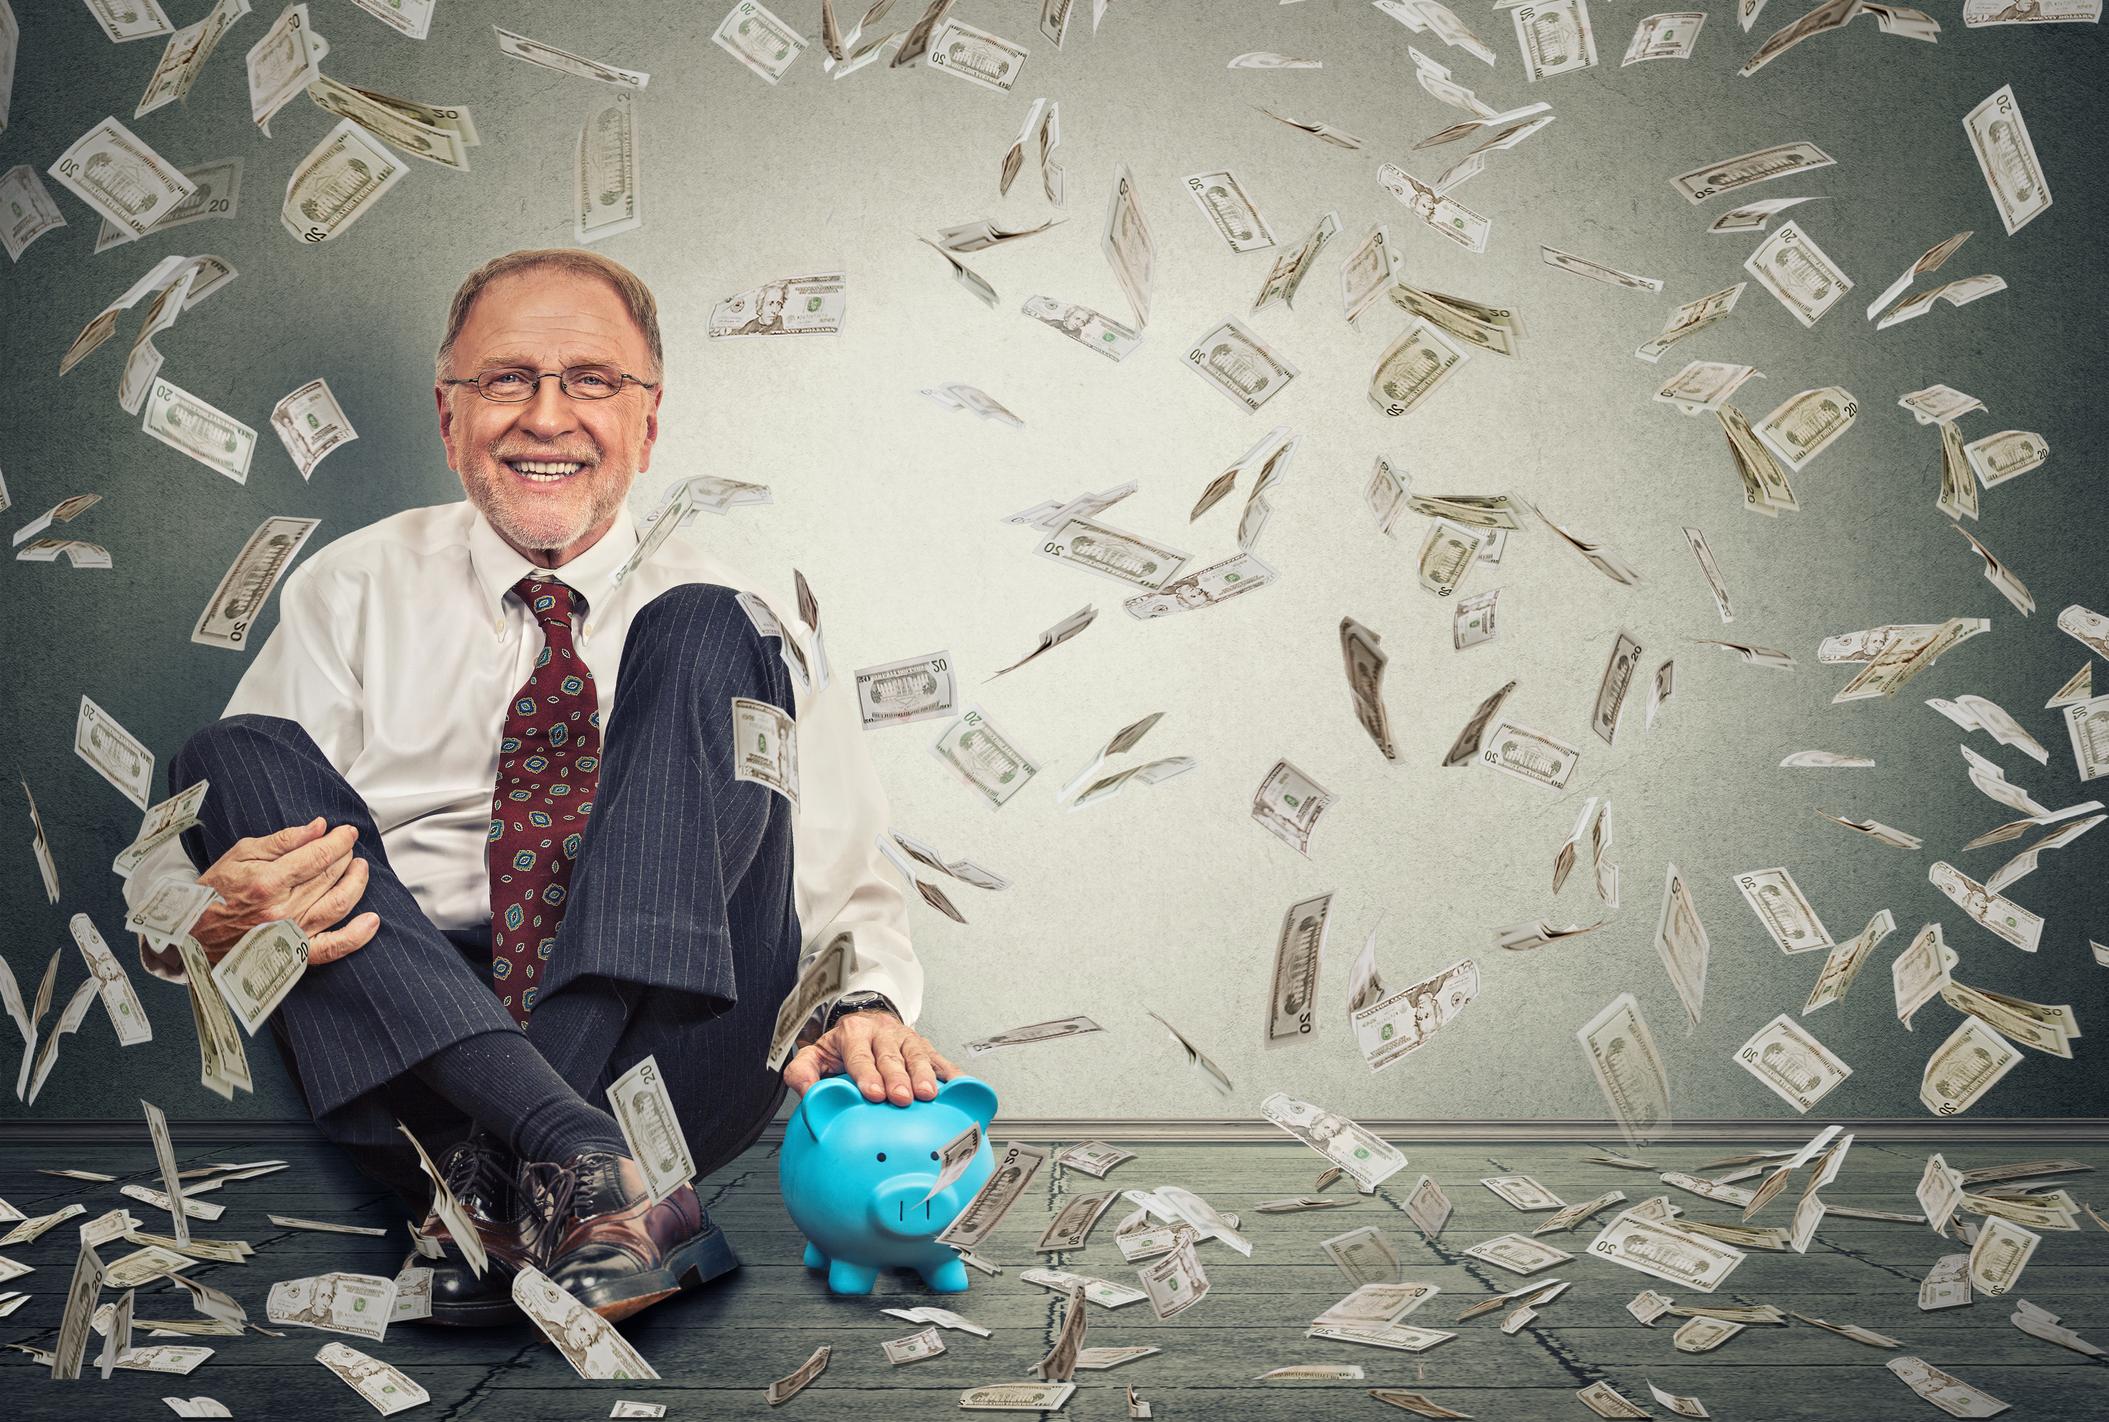 Man sitting on floor next to piggy bank while money rains down